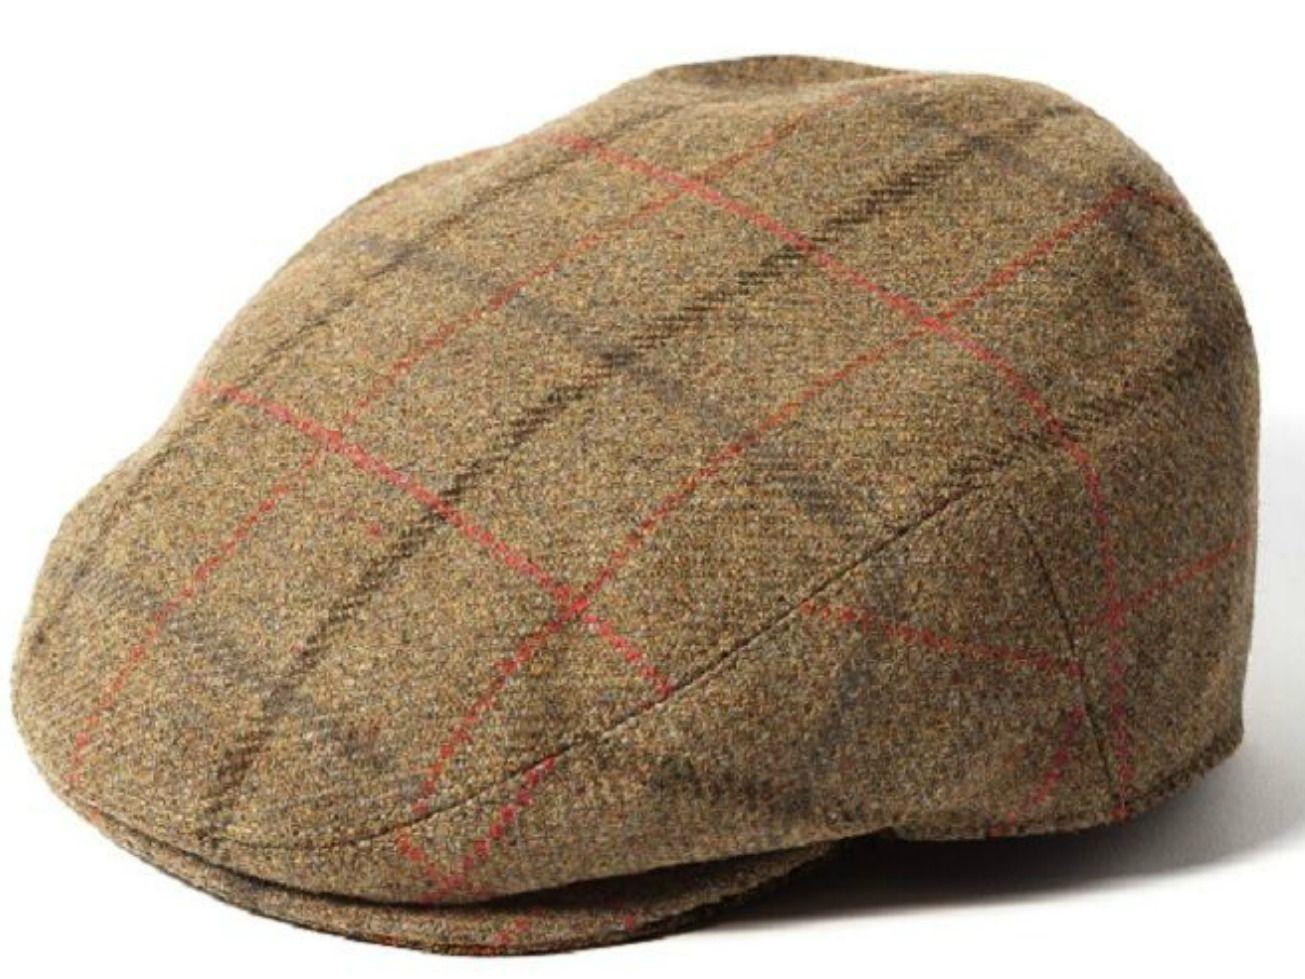 Failsworth Gamekeeper Tweed Flat Cap - Green/Red Windowpane Check